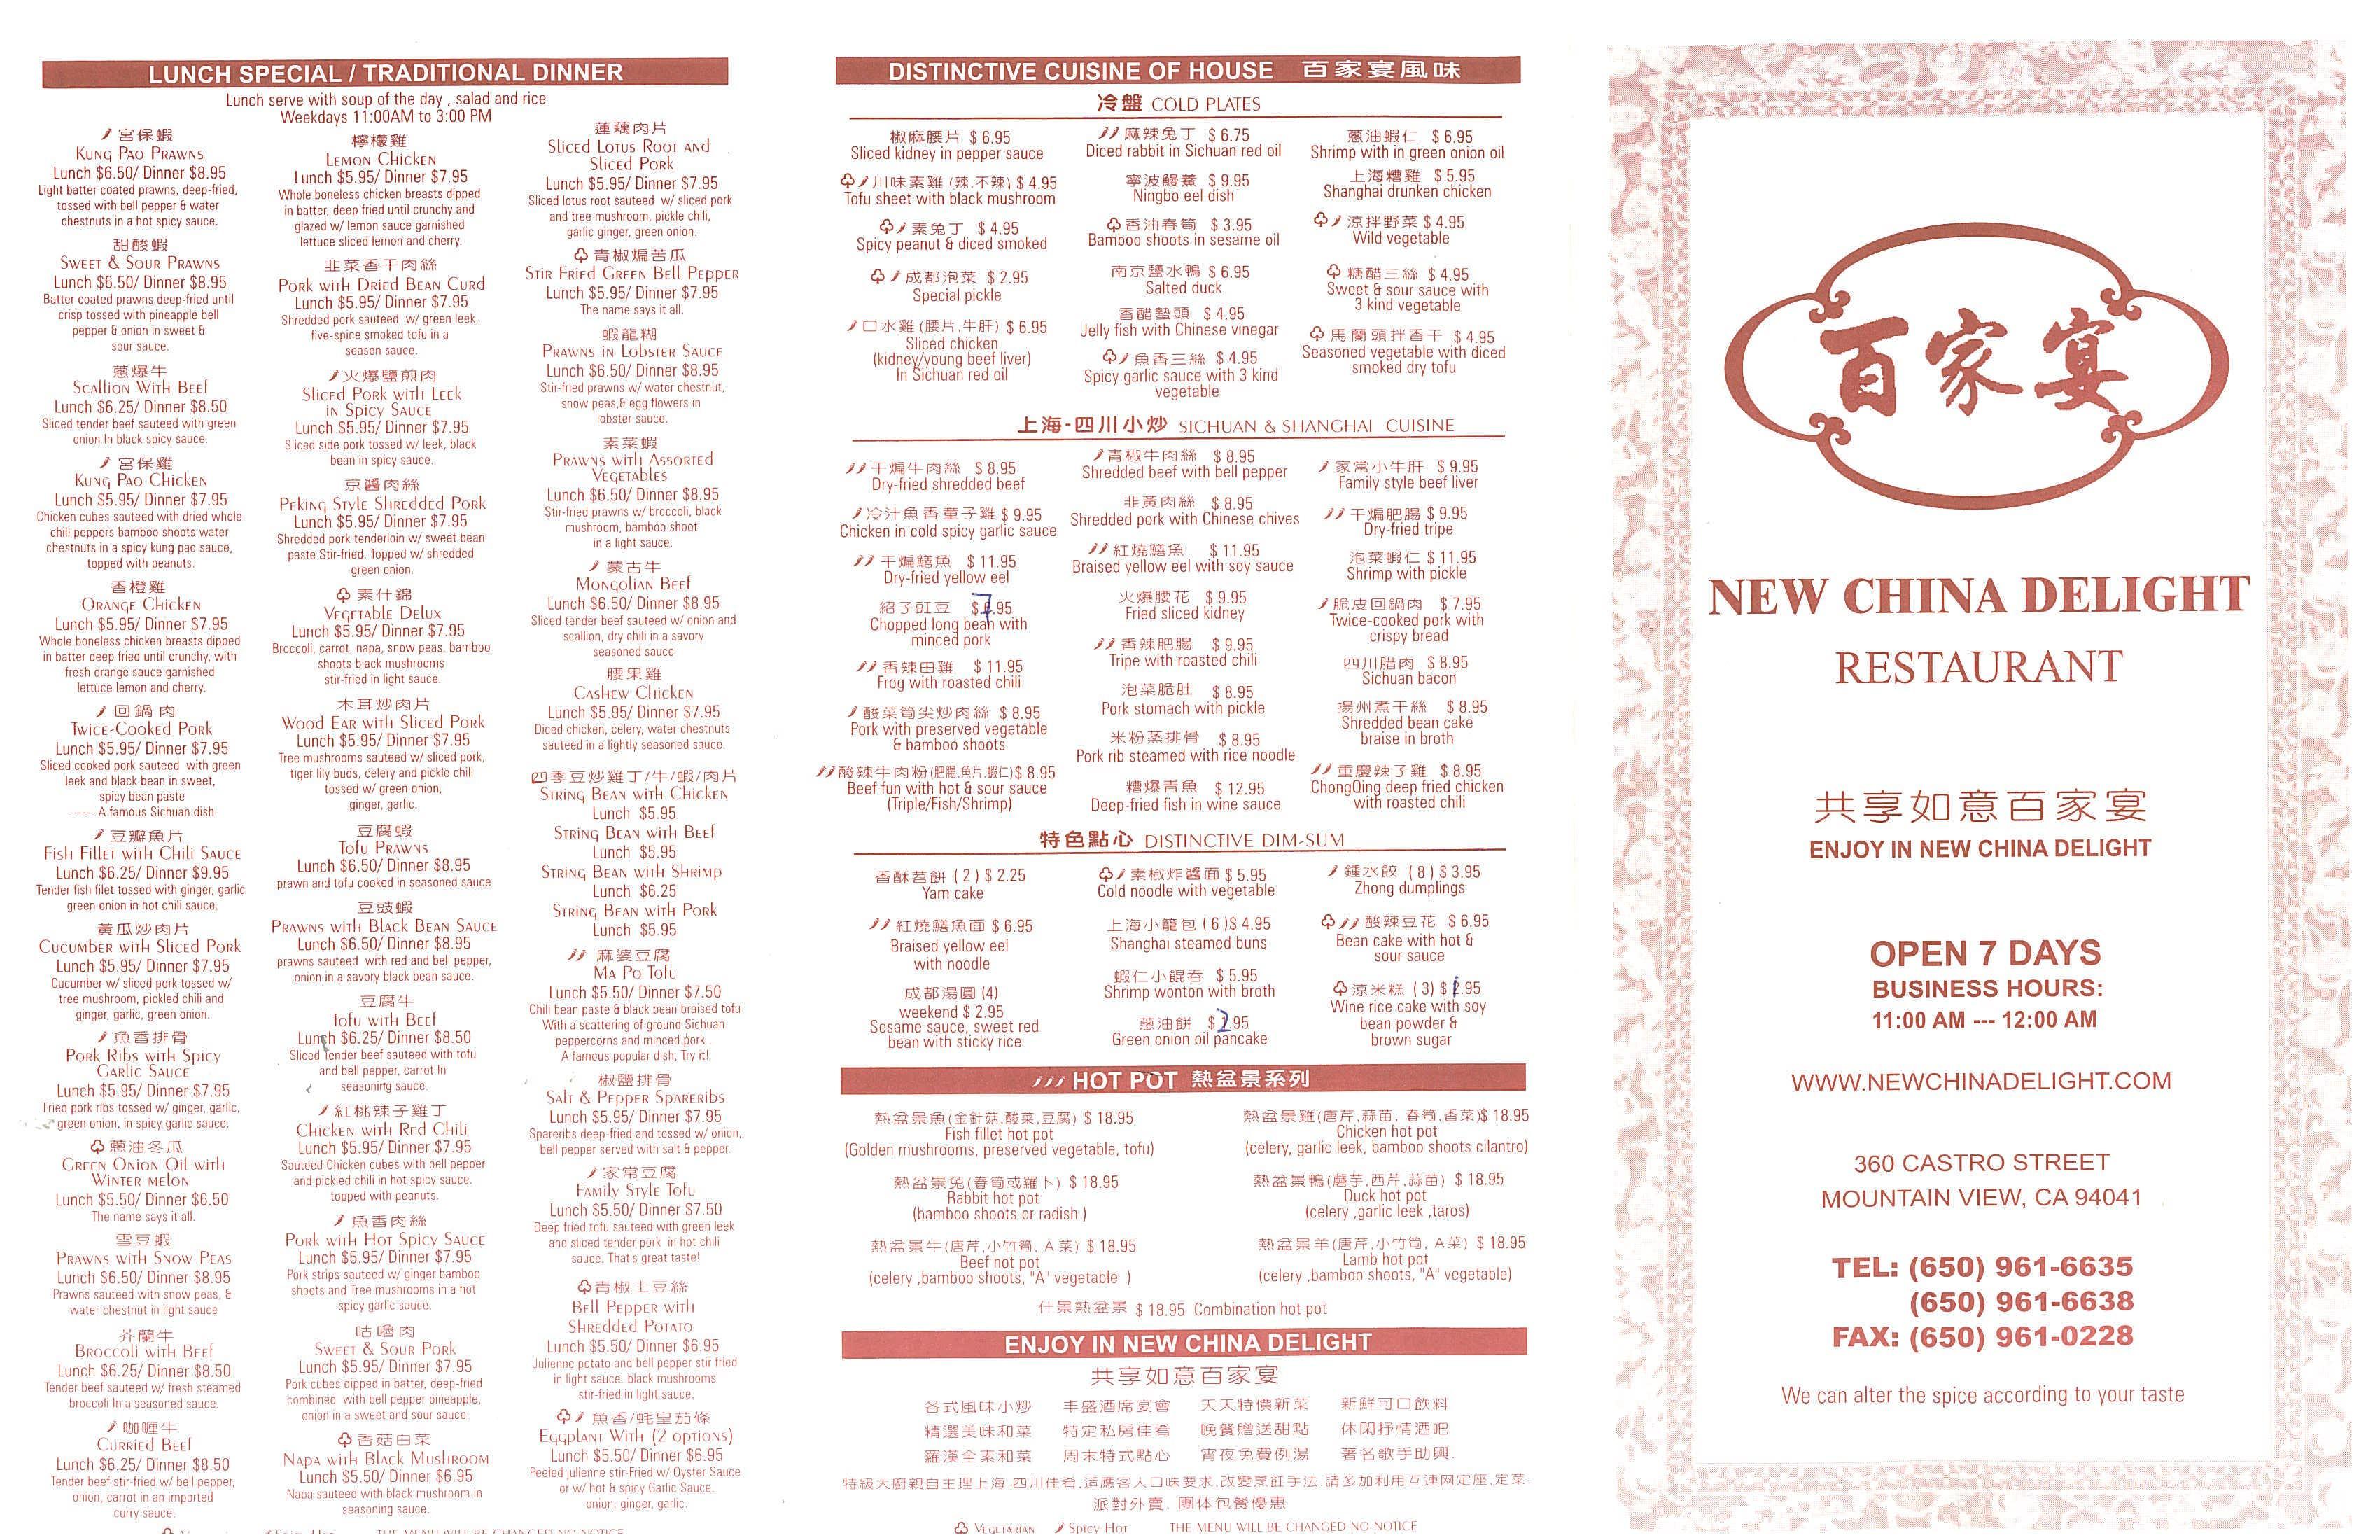 China delight